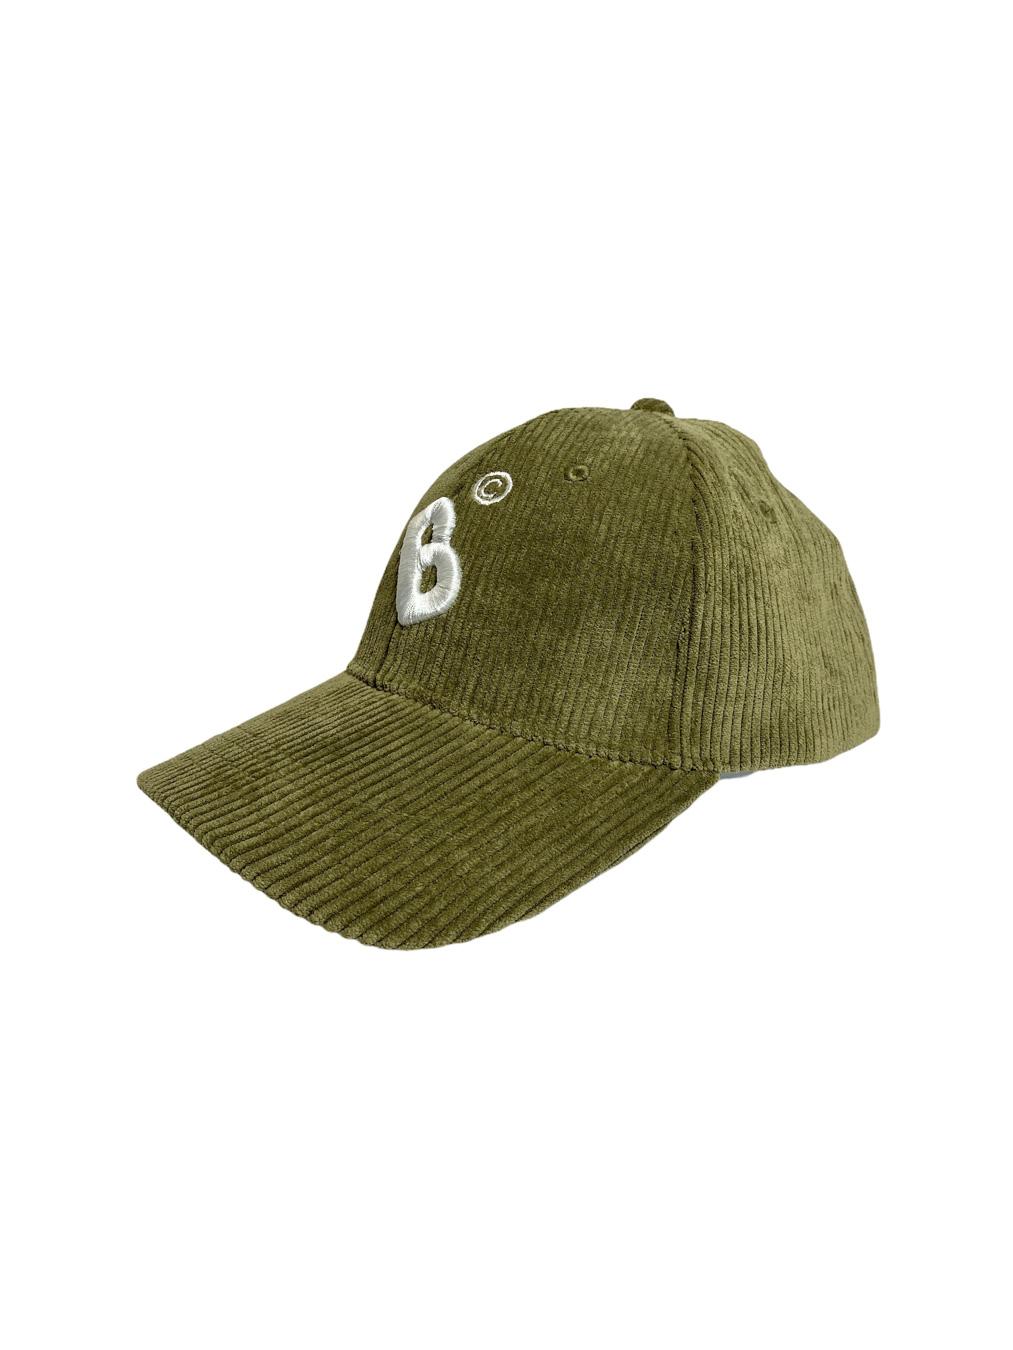 Bangkokr Cap (Olive Corduroy)